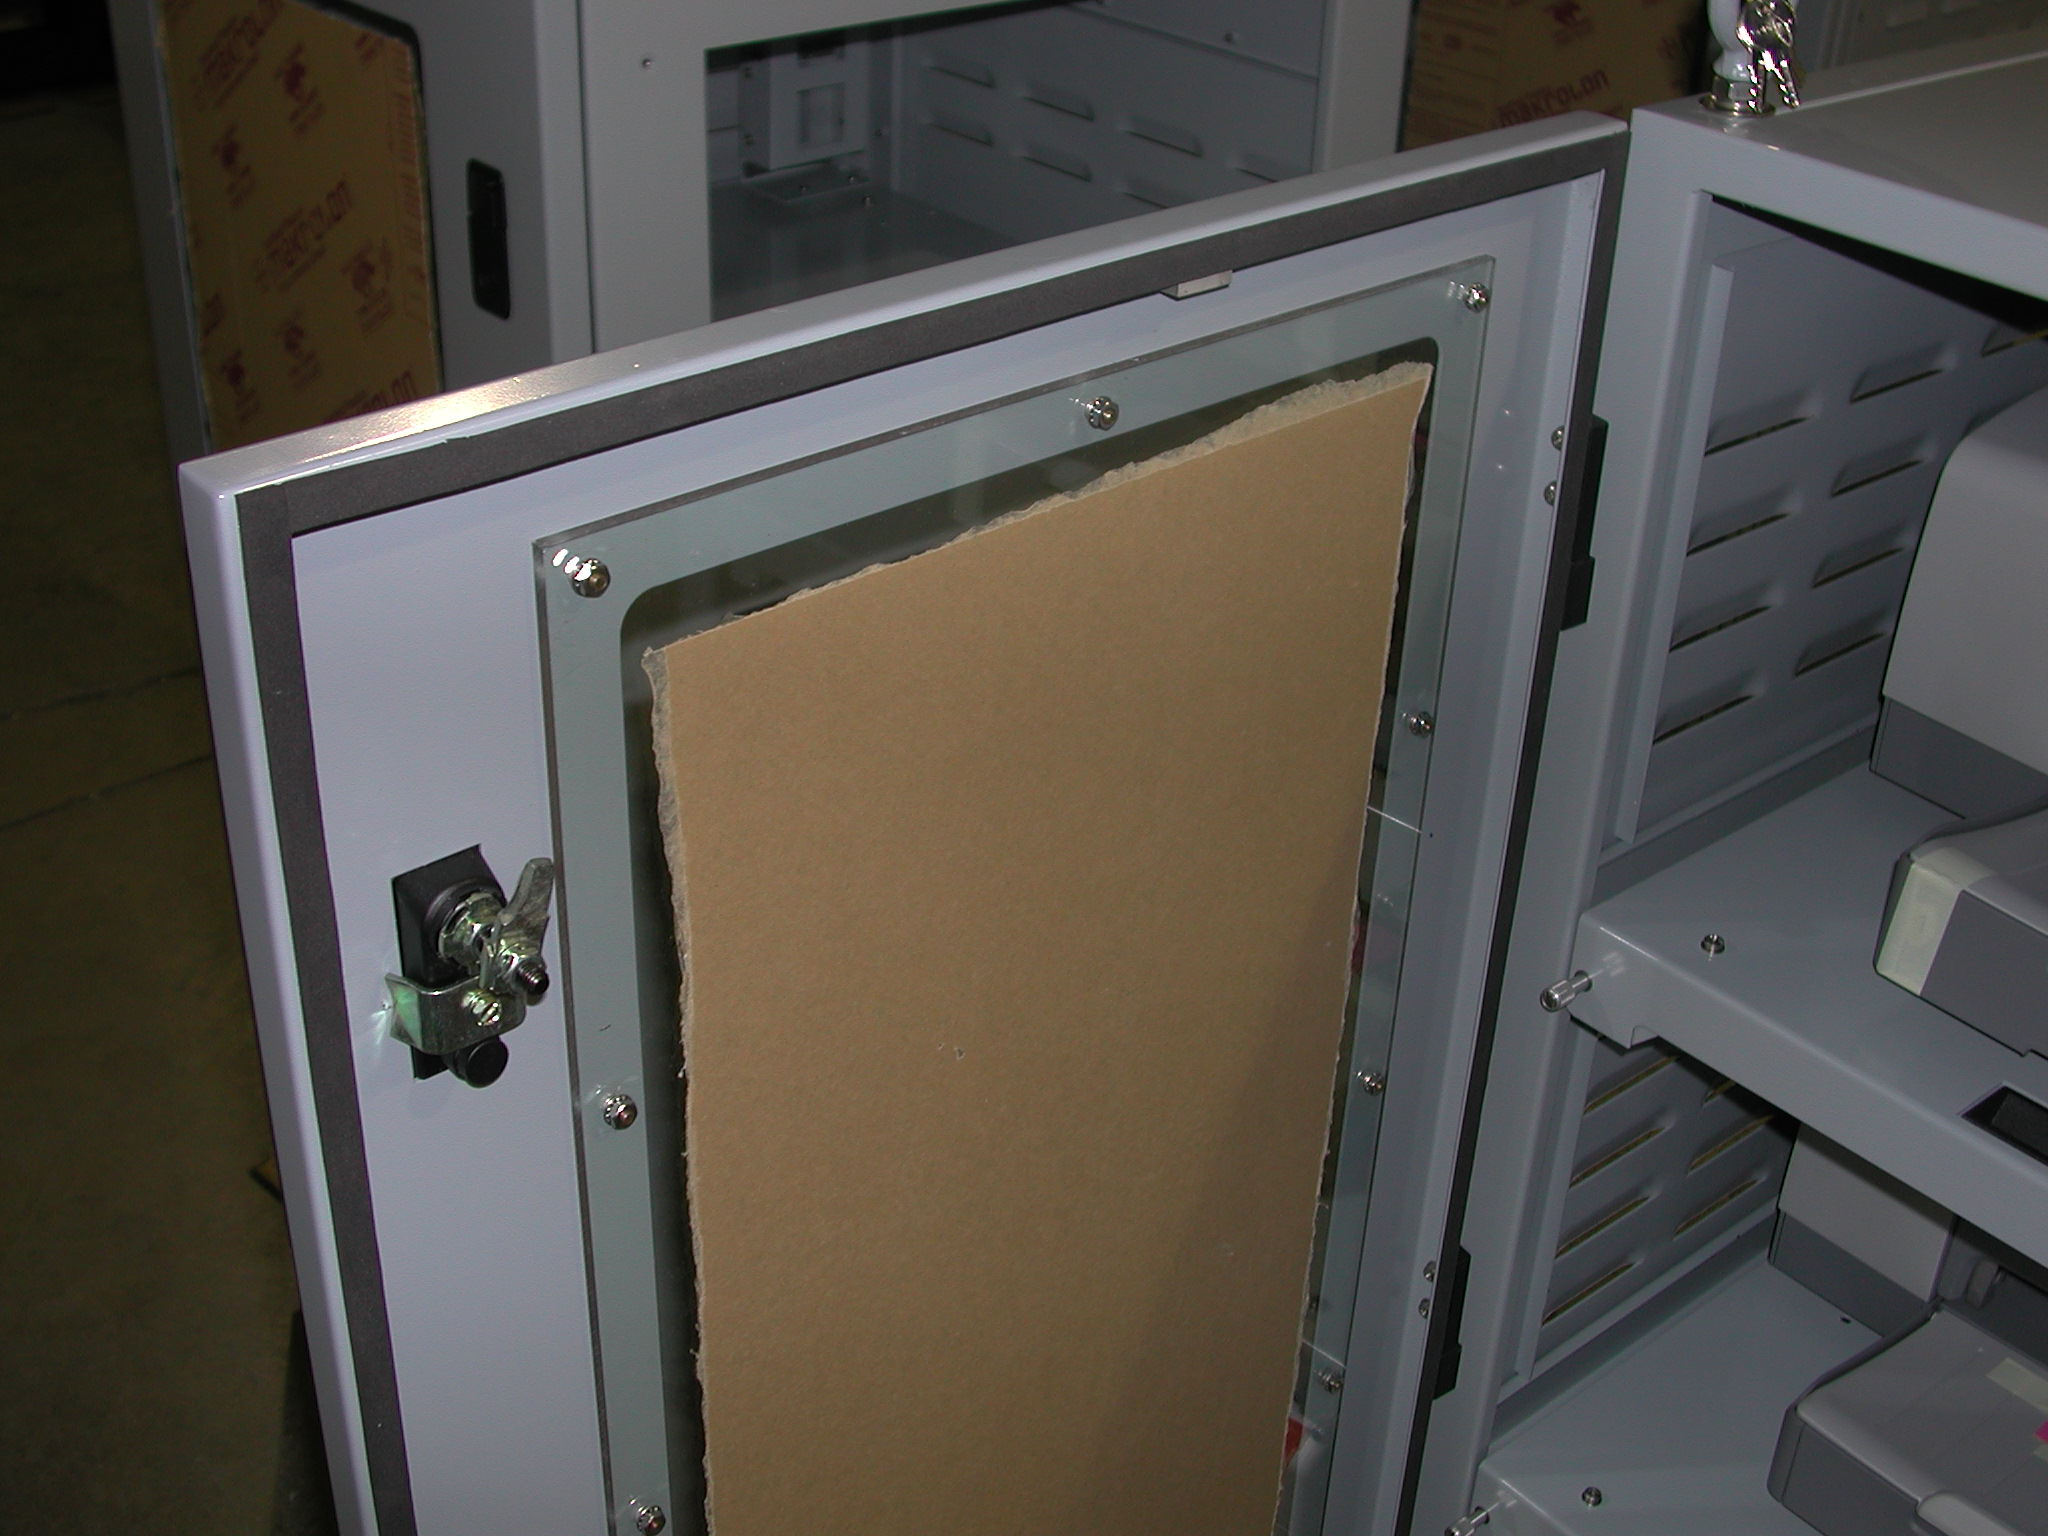 Metal Enclosures Millitary Hopewell Precision NY DSCN1640.JPG